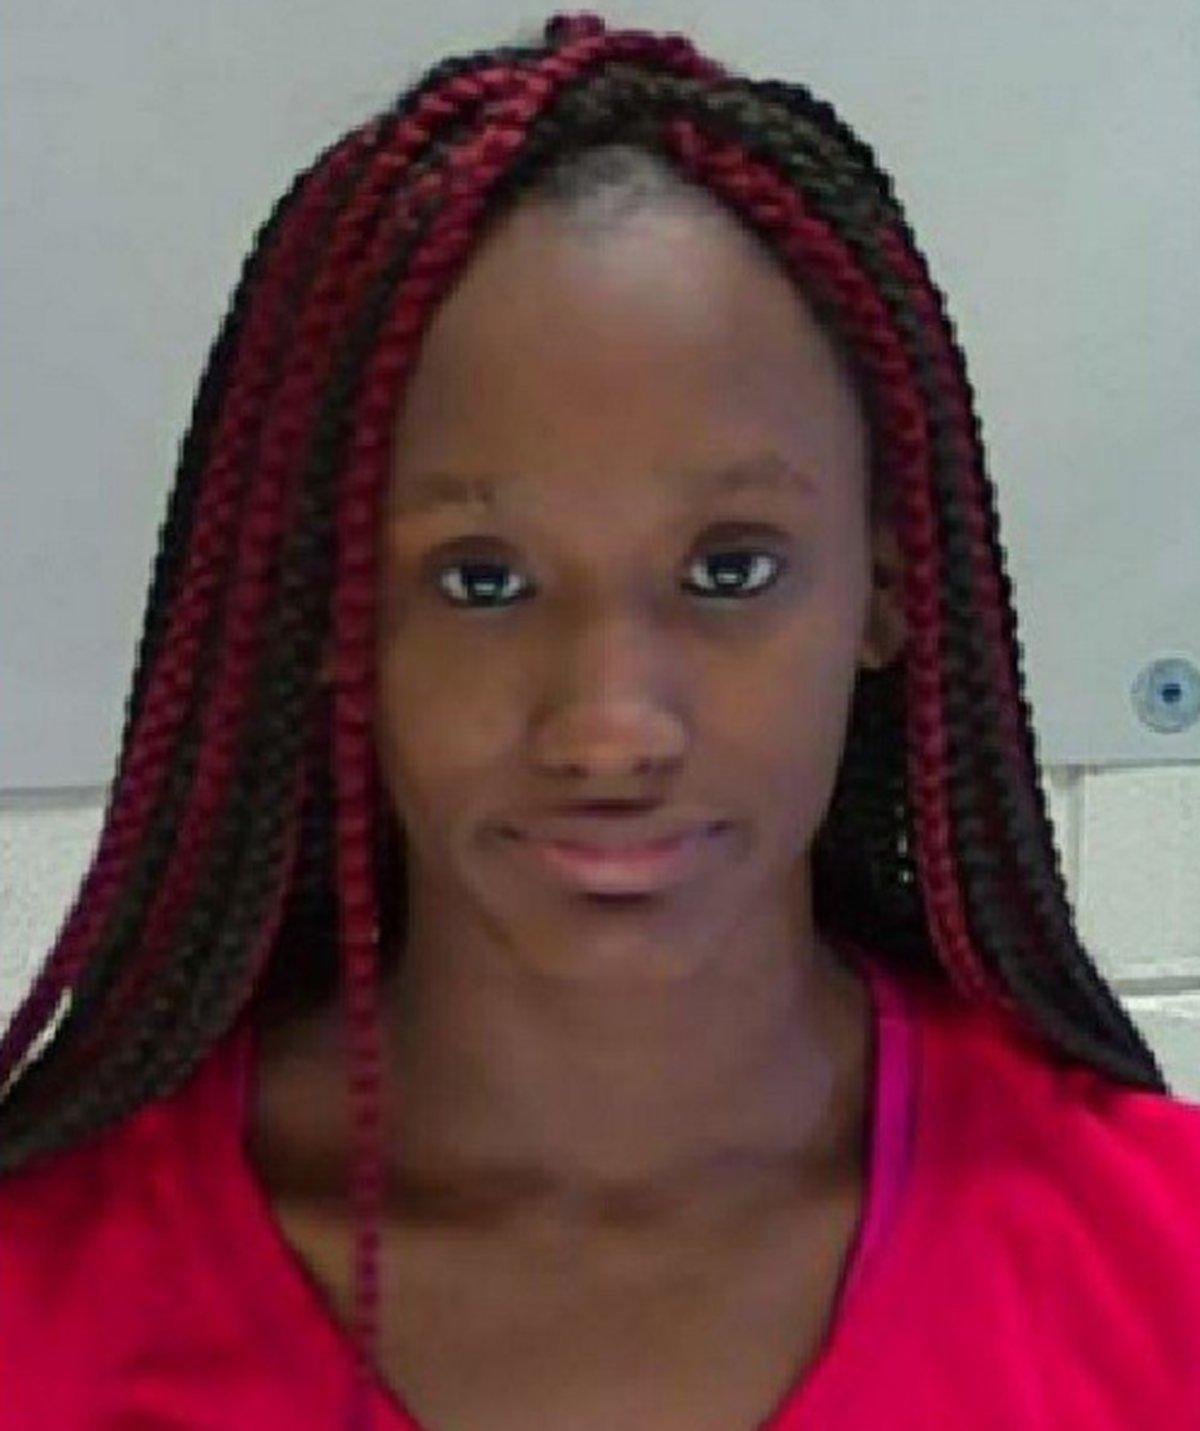 Sky Juliette Samuel is accused of smearing her menstrual blood in a hamburger